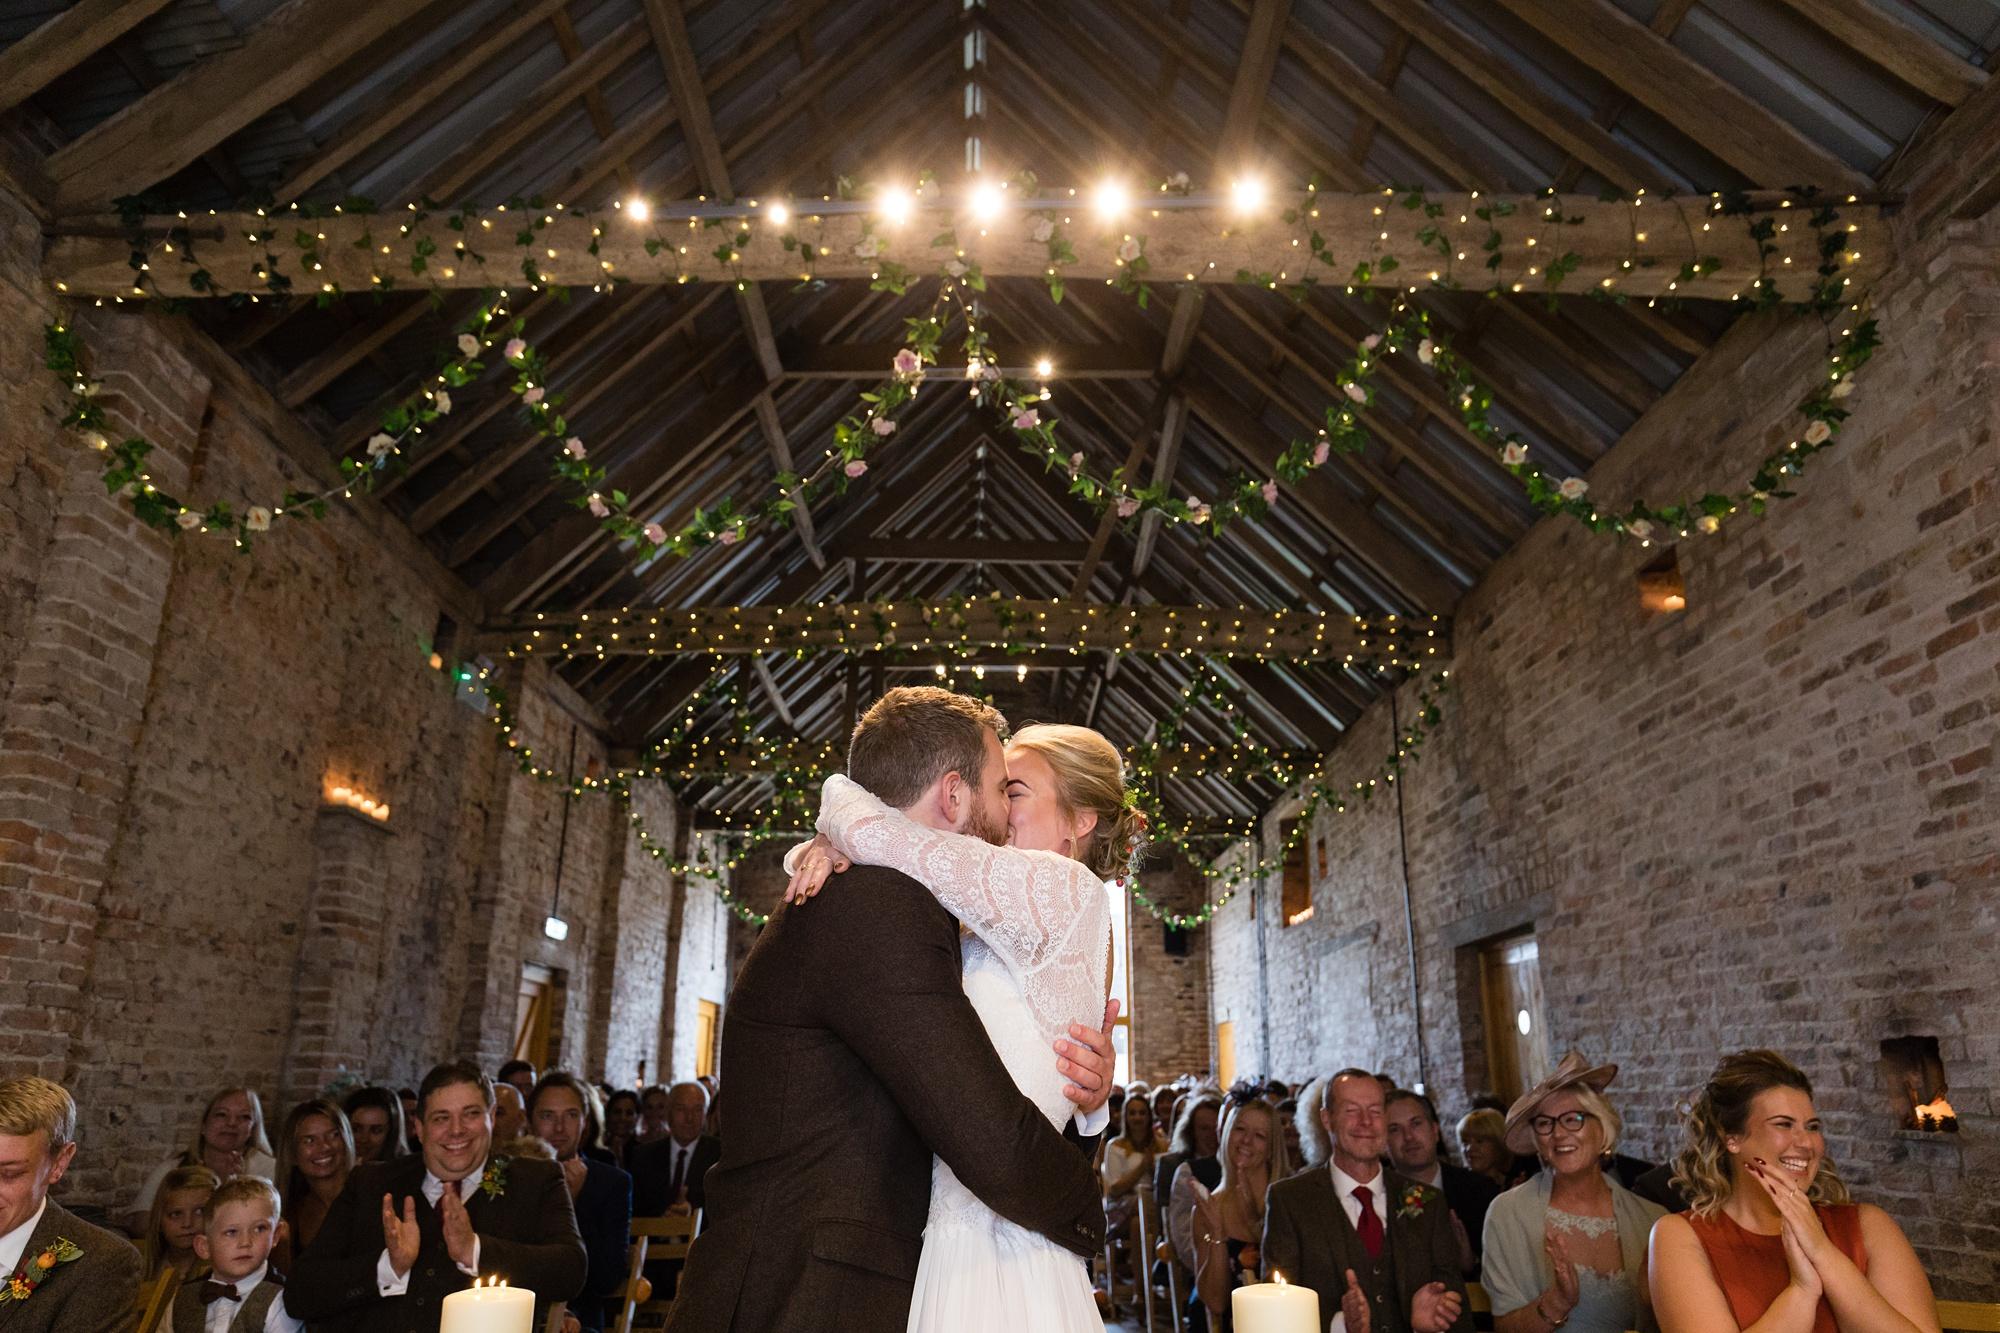 Yorkshire Wedding Photographers at Barmbyfield Barn big first kiss under fairy lights